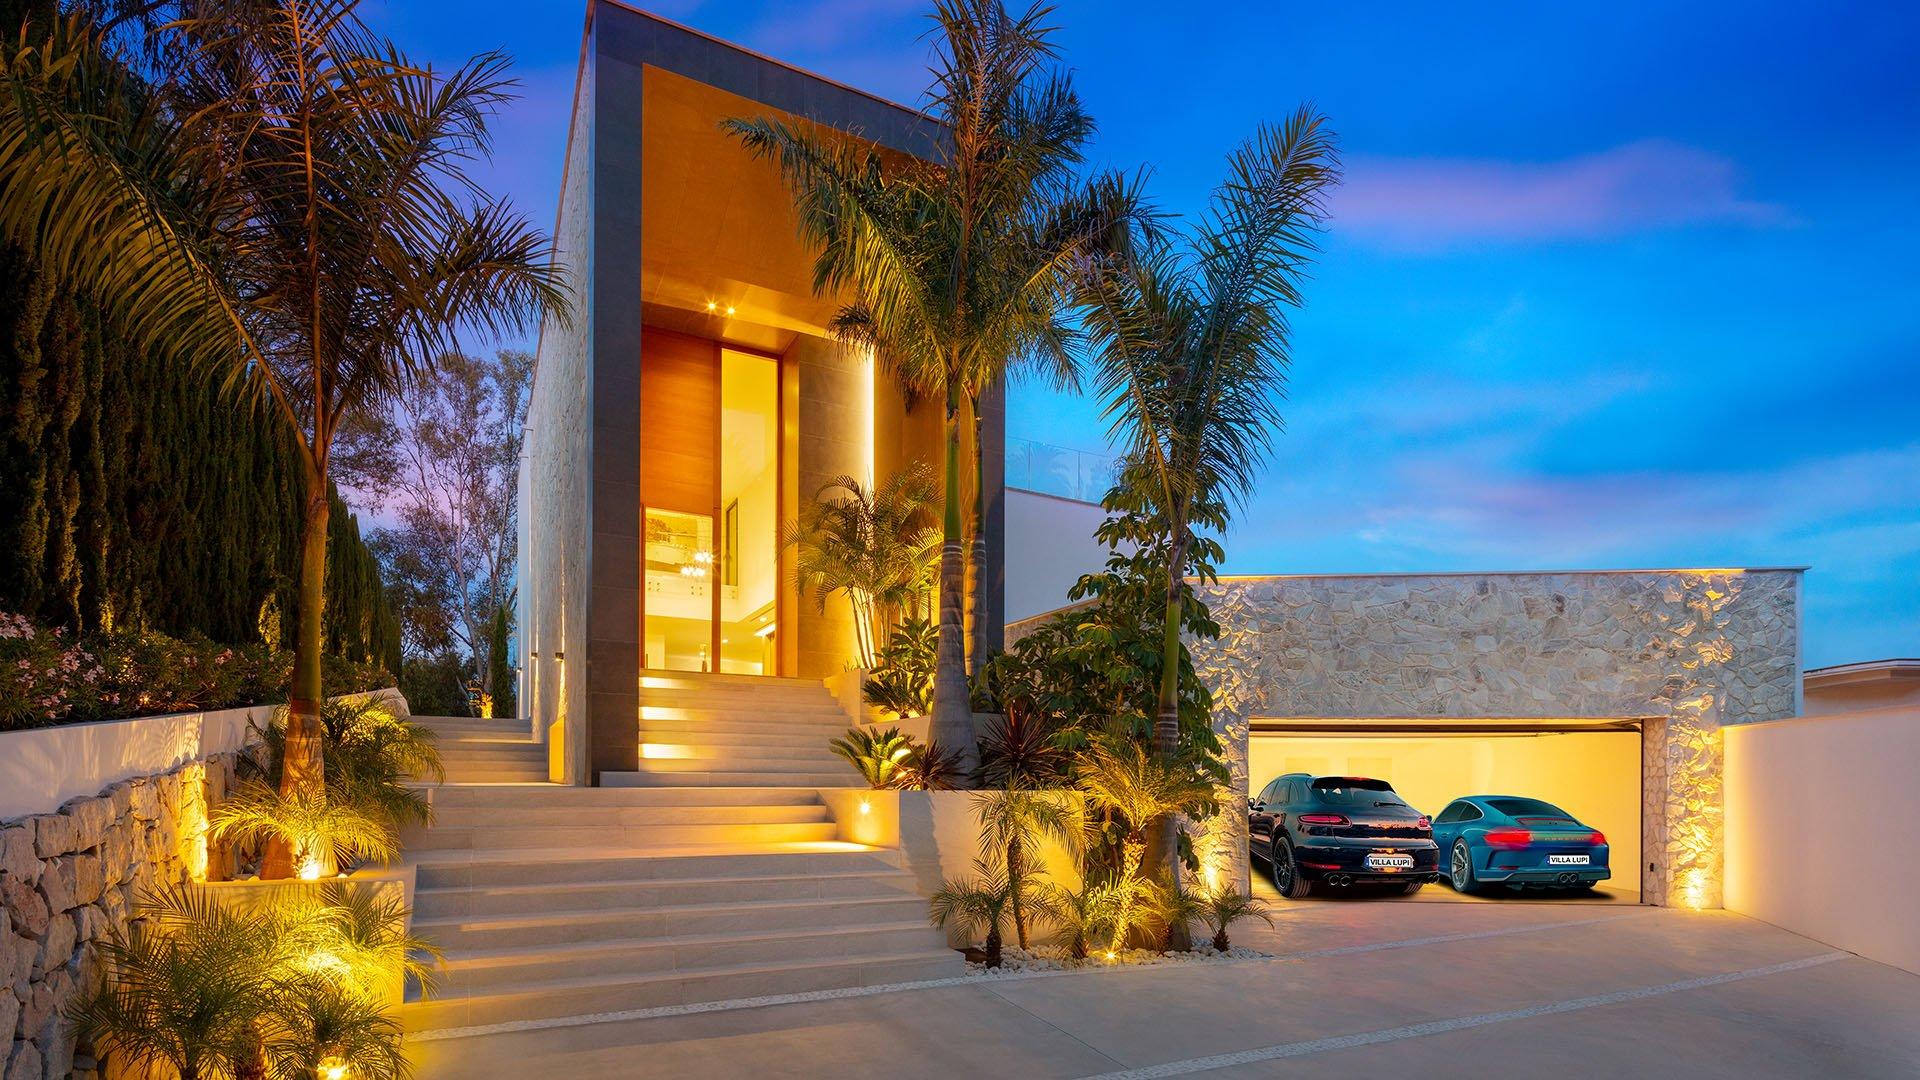 Villa Lupi: Prachtige villa in La Quinta, Marbella